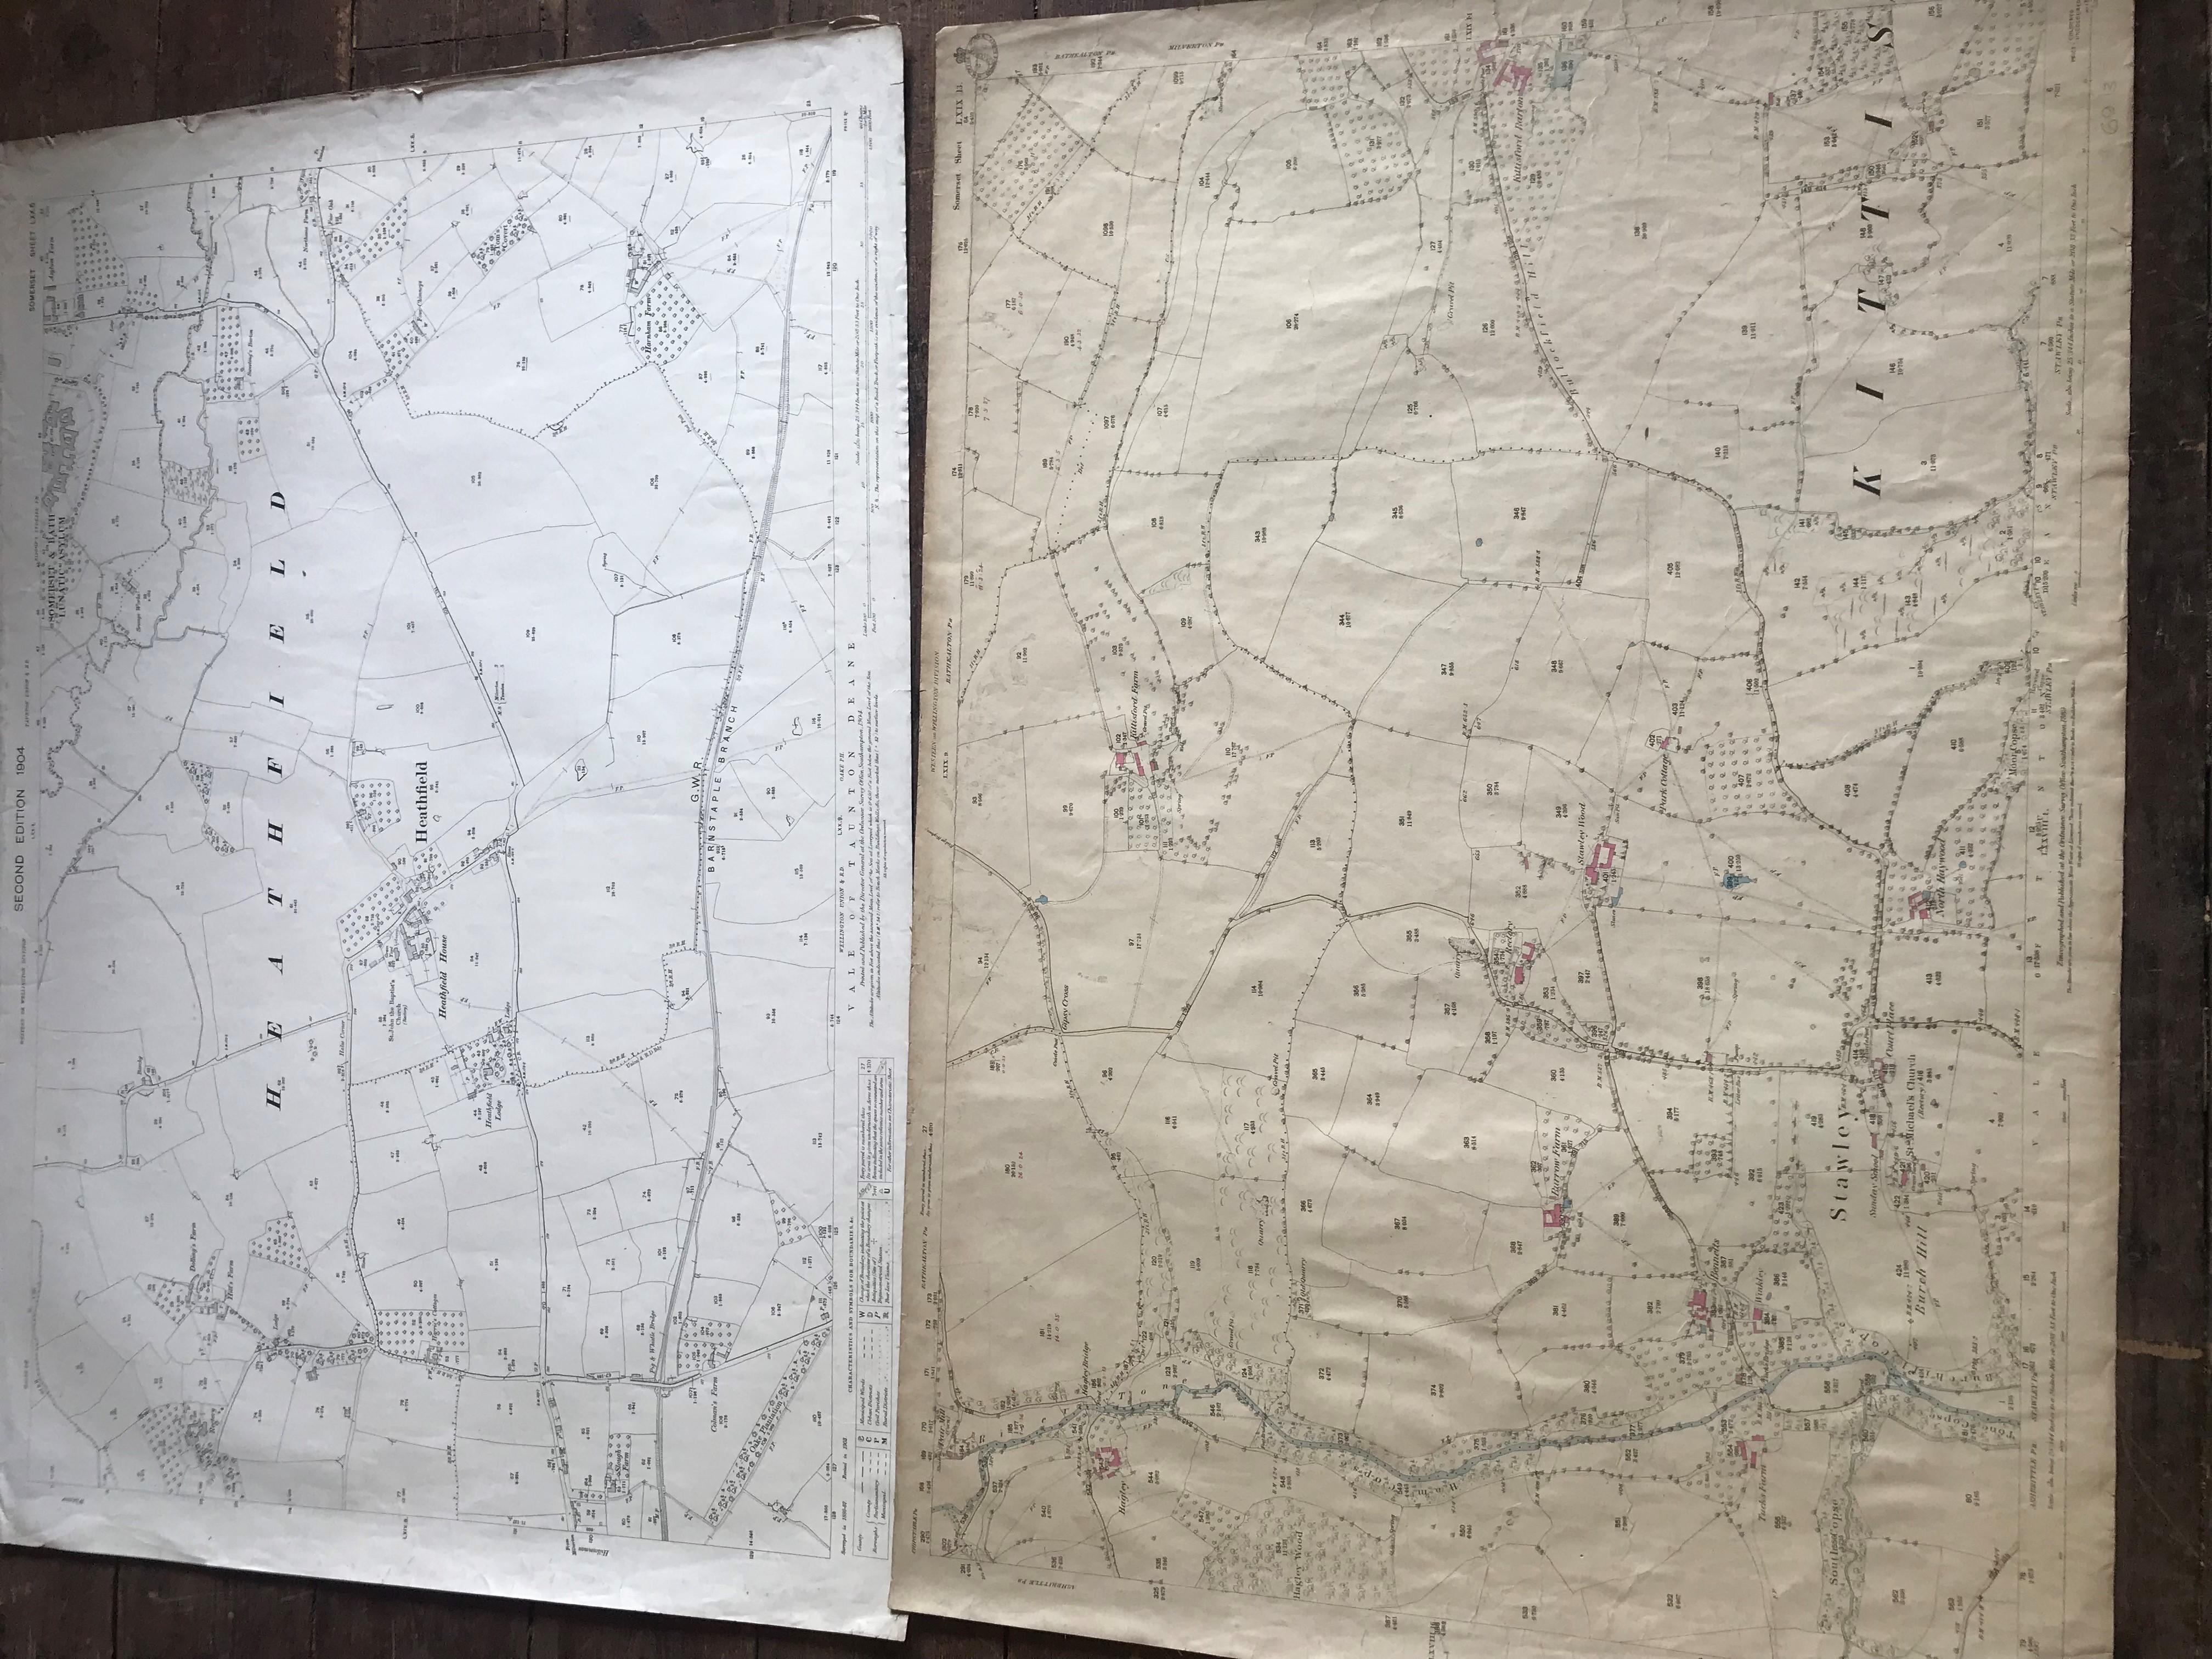 THIRTY 1:2500 ORDNANCE SURVEY MAPS featuring Chelston, Ham, Sampford Brett, Wellington, - Image 16 of 16